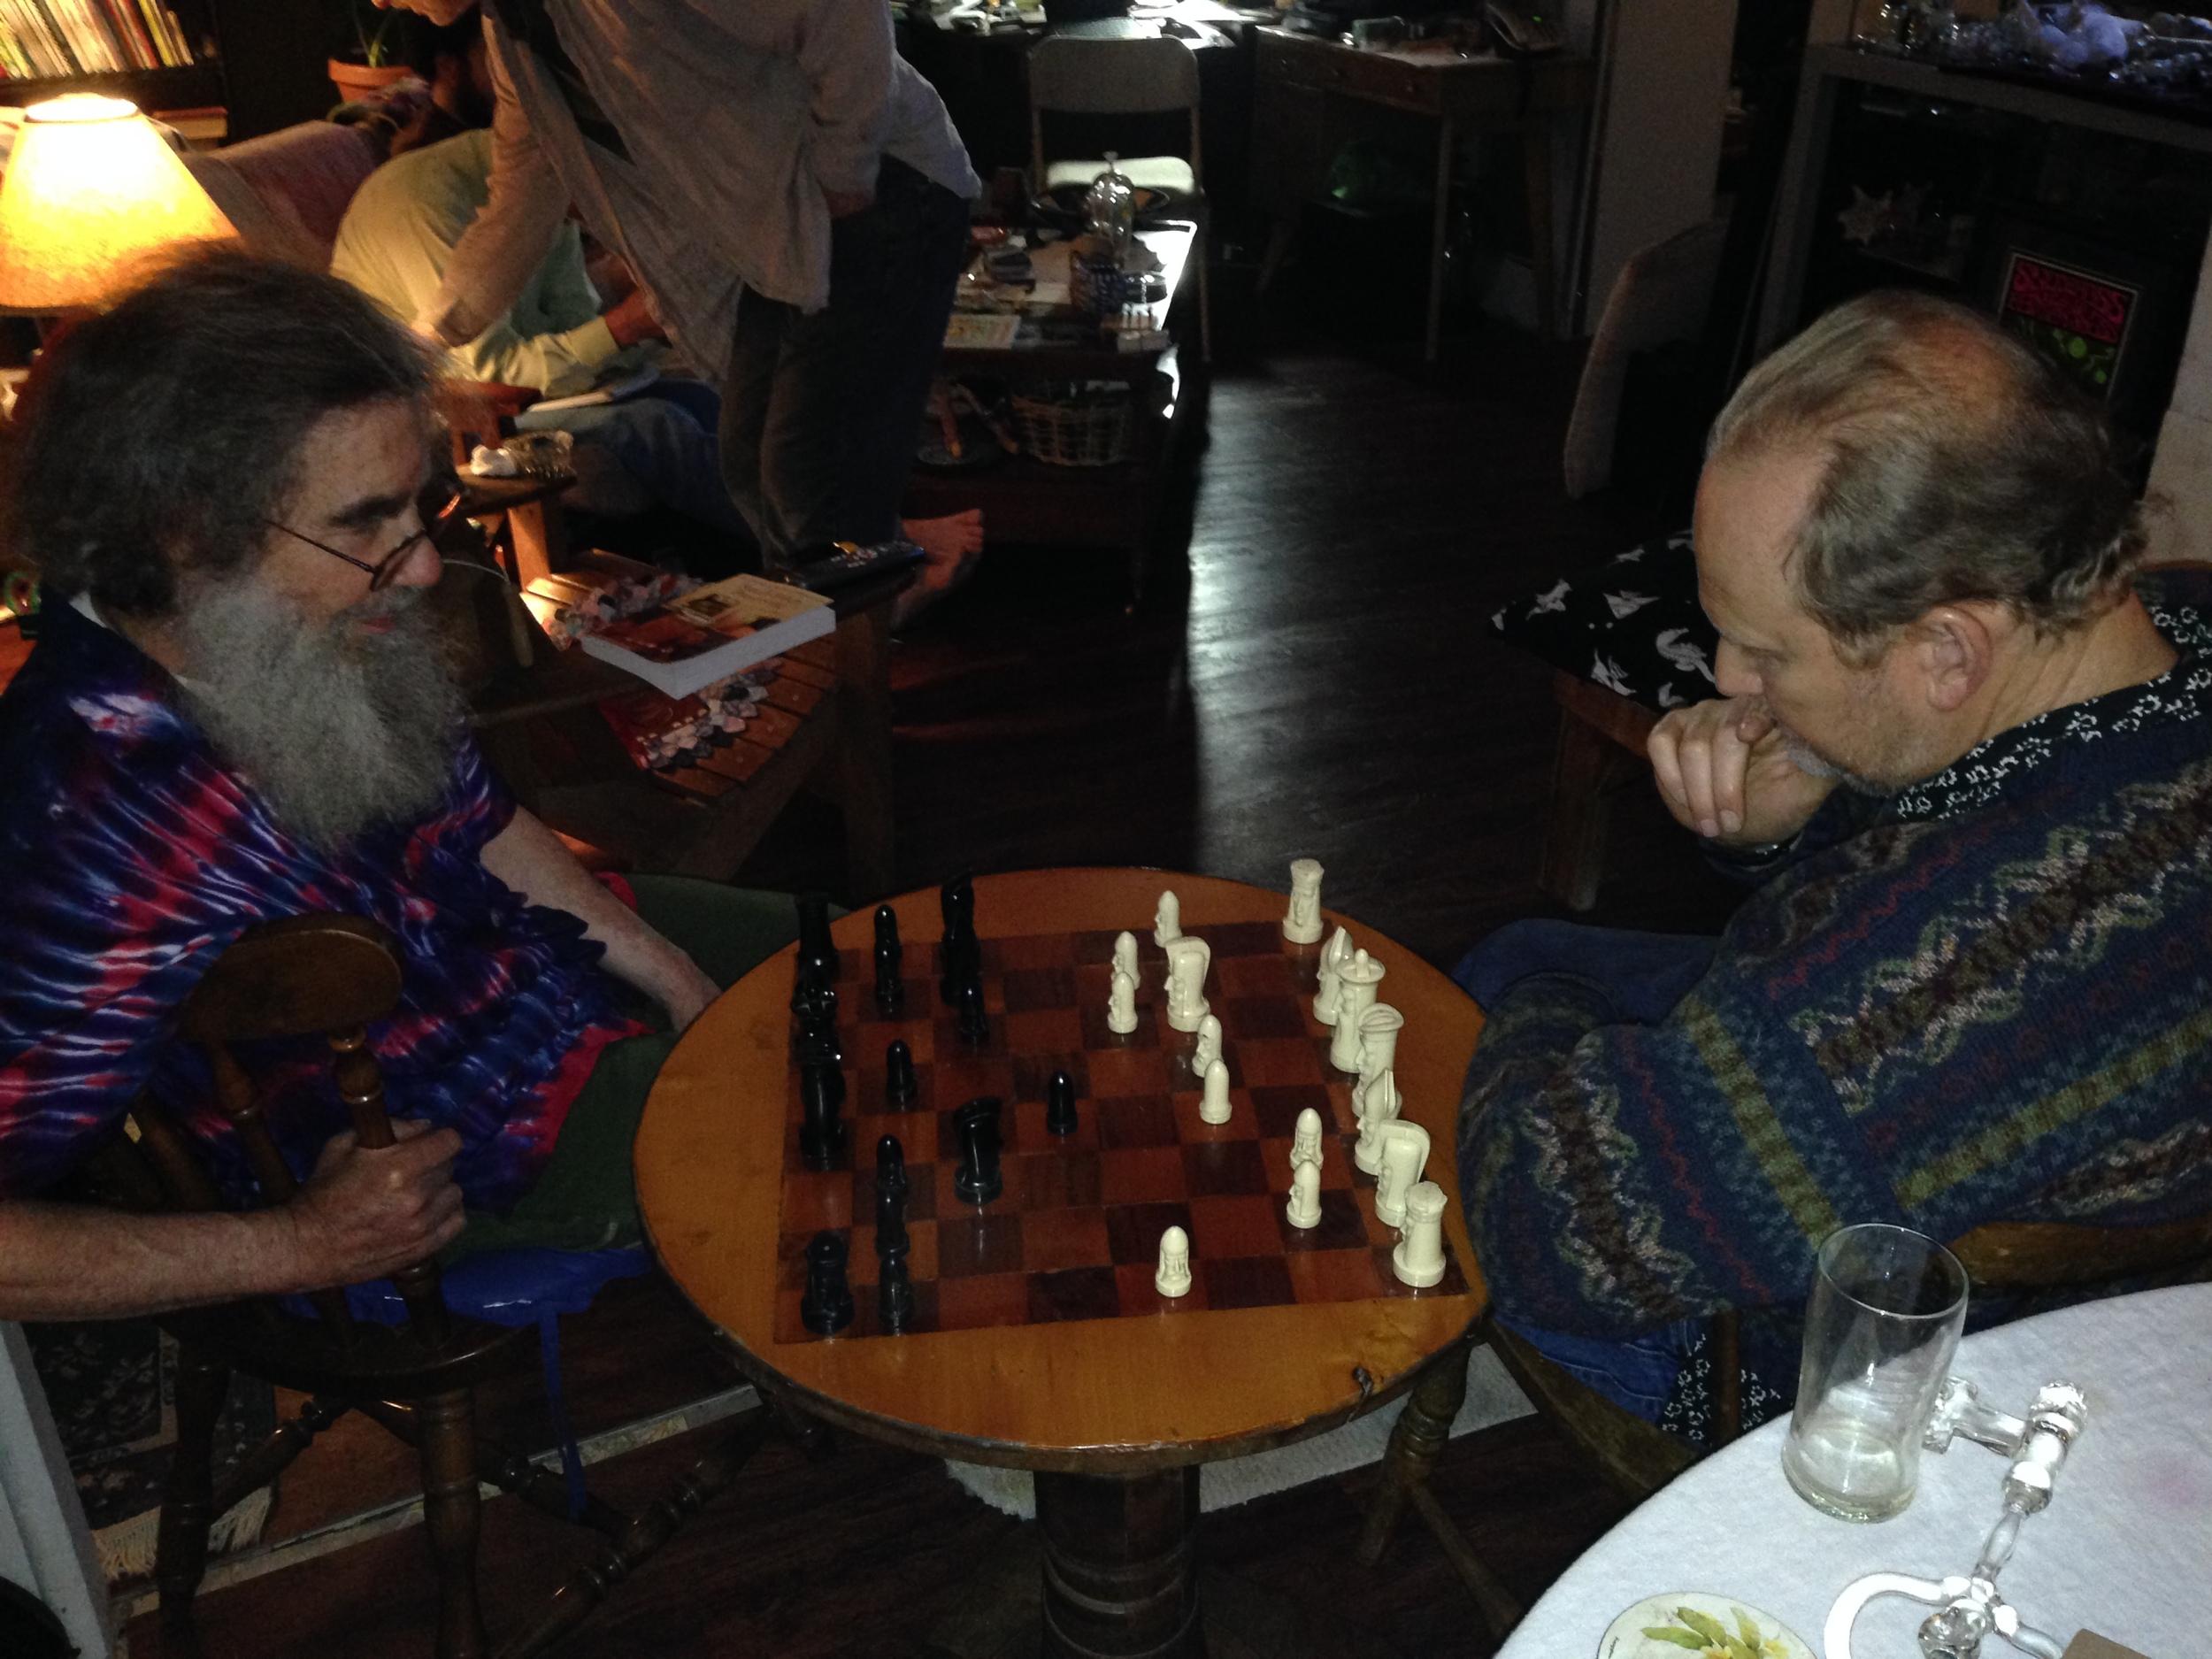 Bob Snodgrass kicking Bandhu's butt at Chess